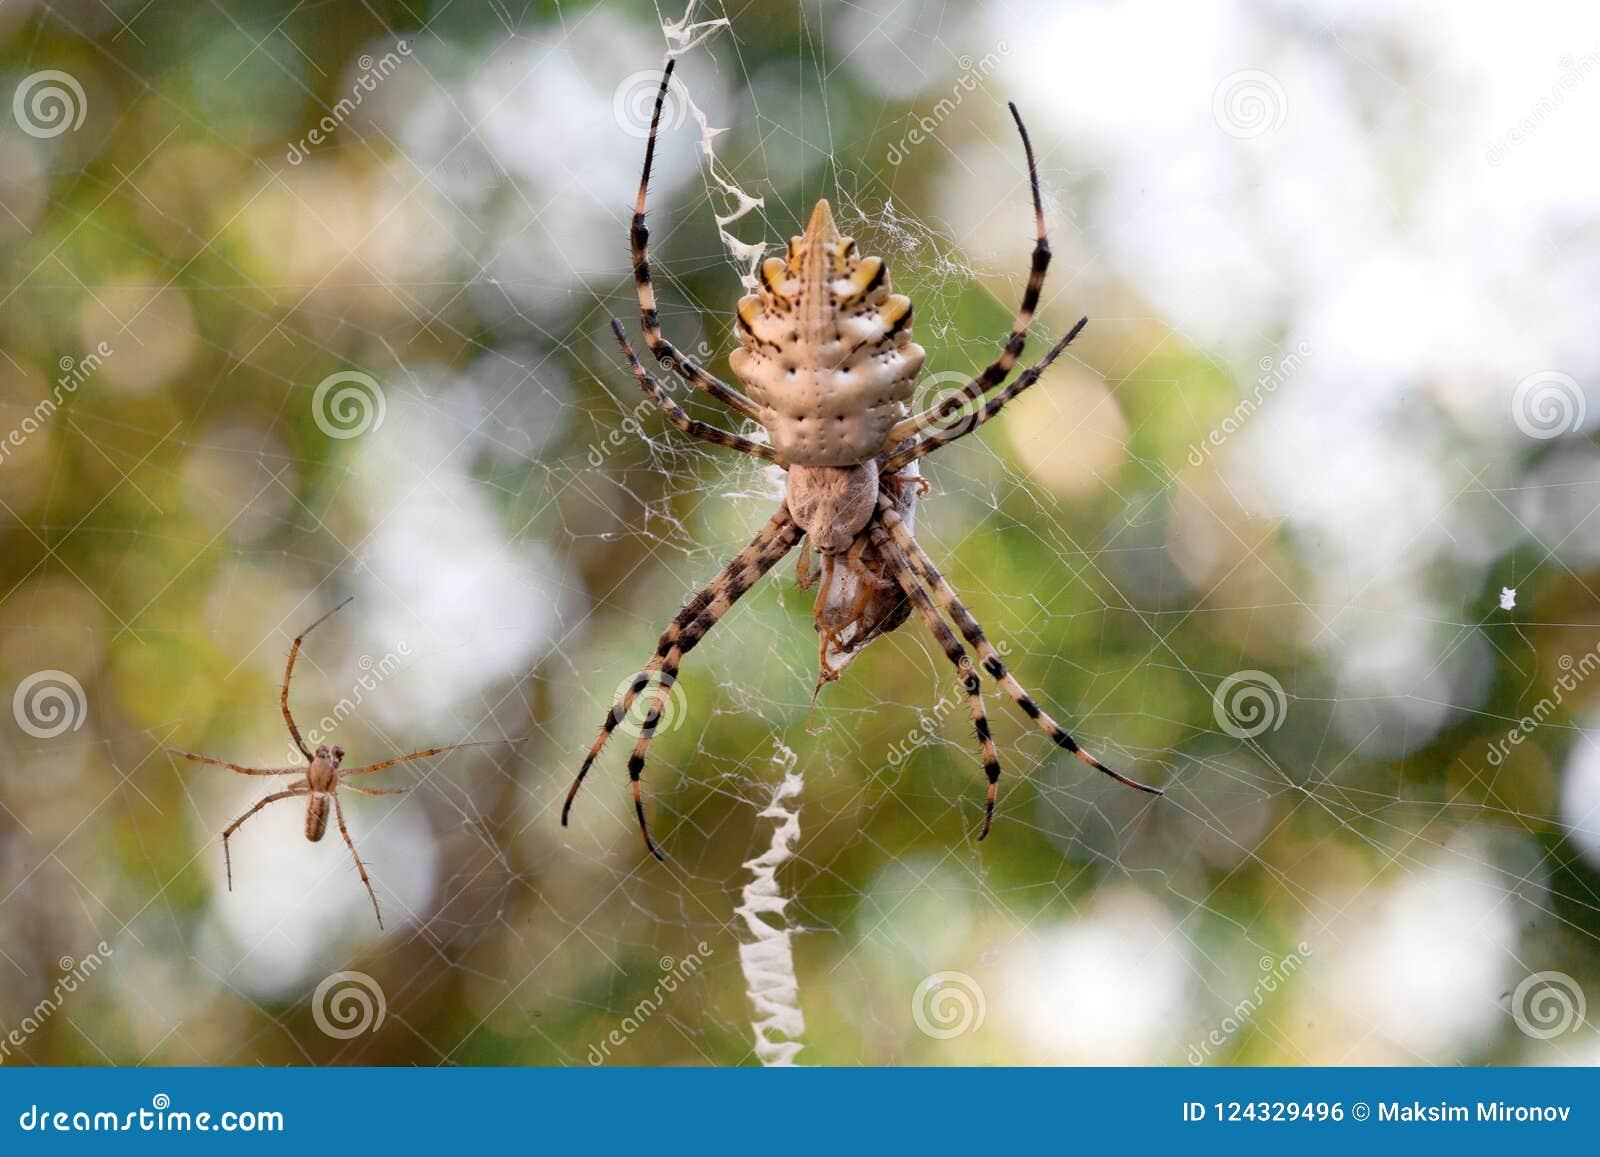 Argiope Lobata Araneidae Stock Photo Image Of Macrophotography